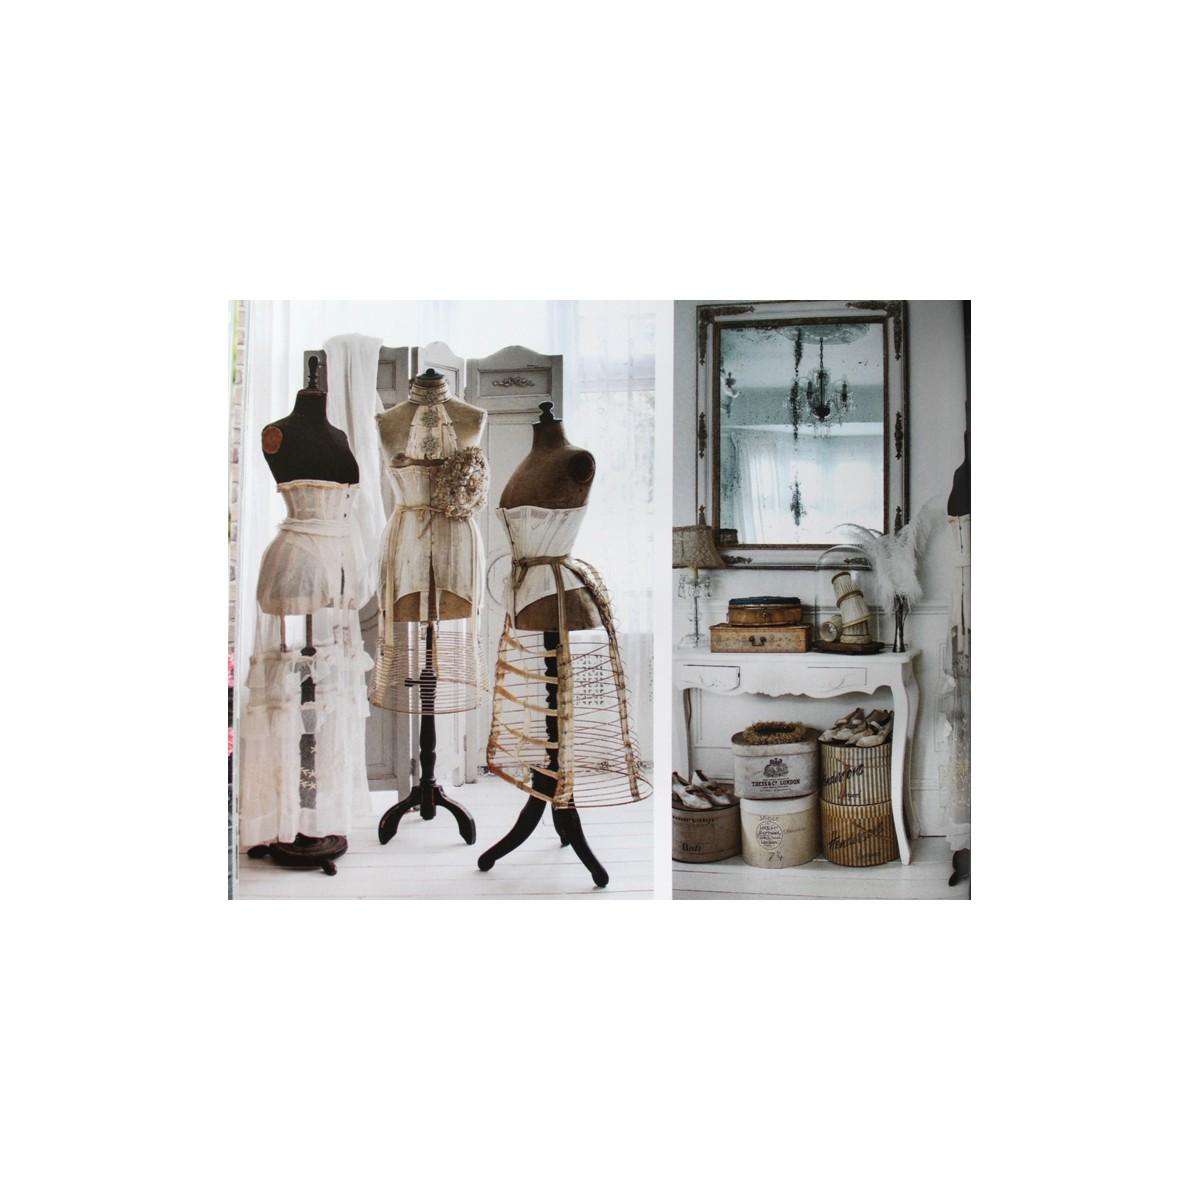 magasinet maison et d co shabby style no 1 2017. Black Bedroom Furniture Sets. Home Design Ideas